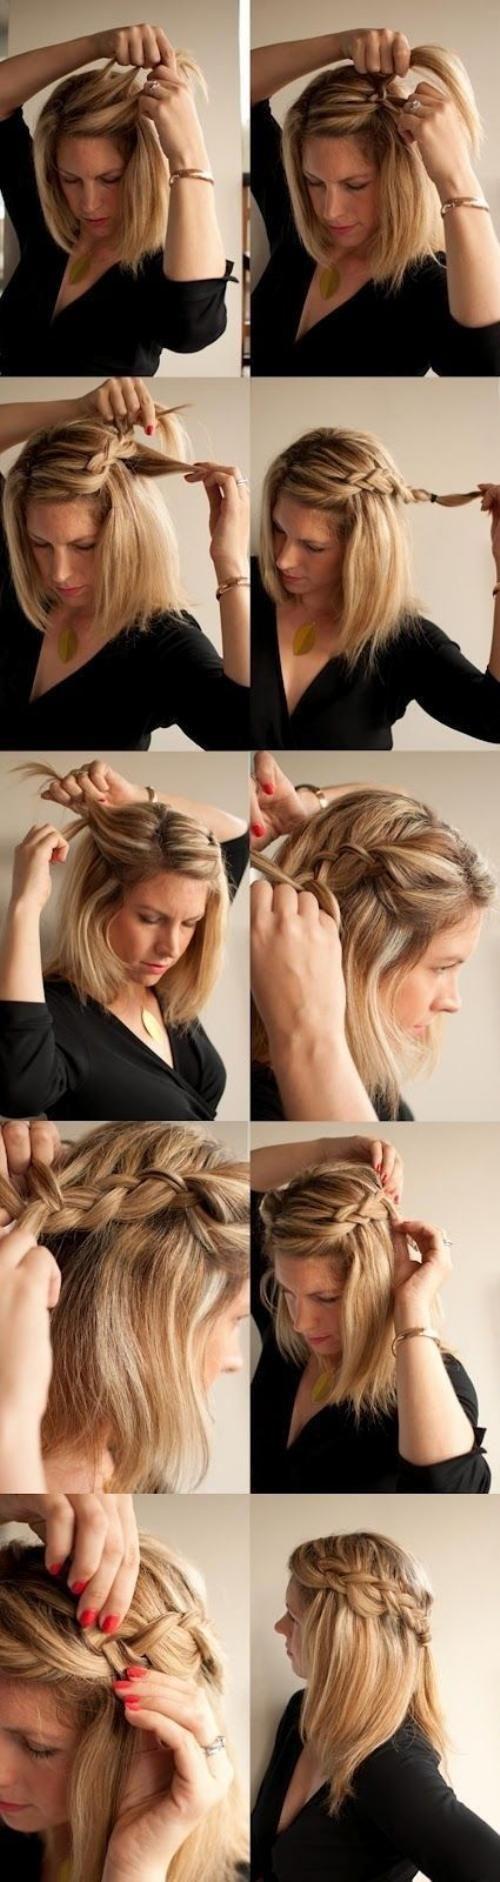 hair-styles-10